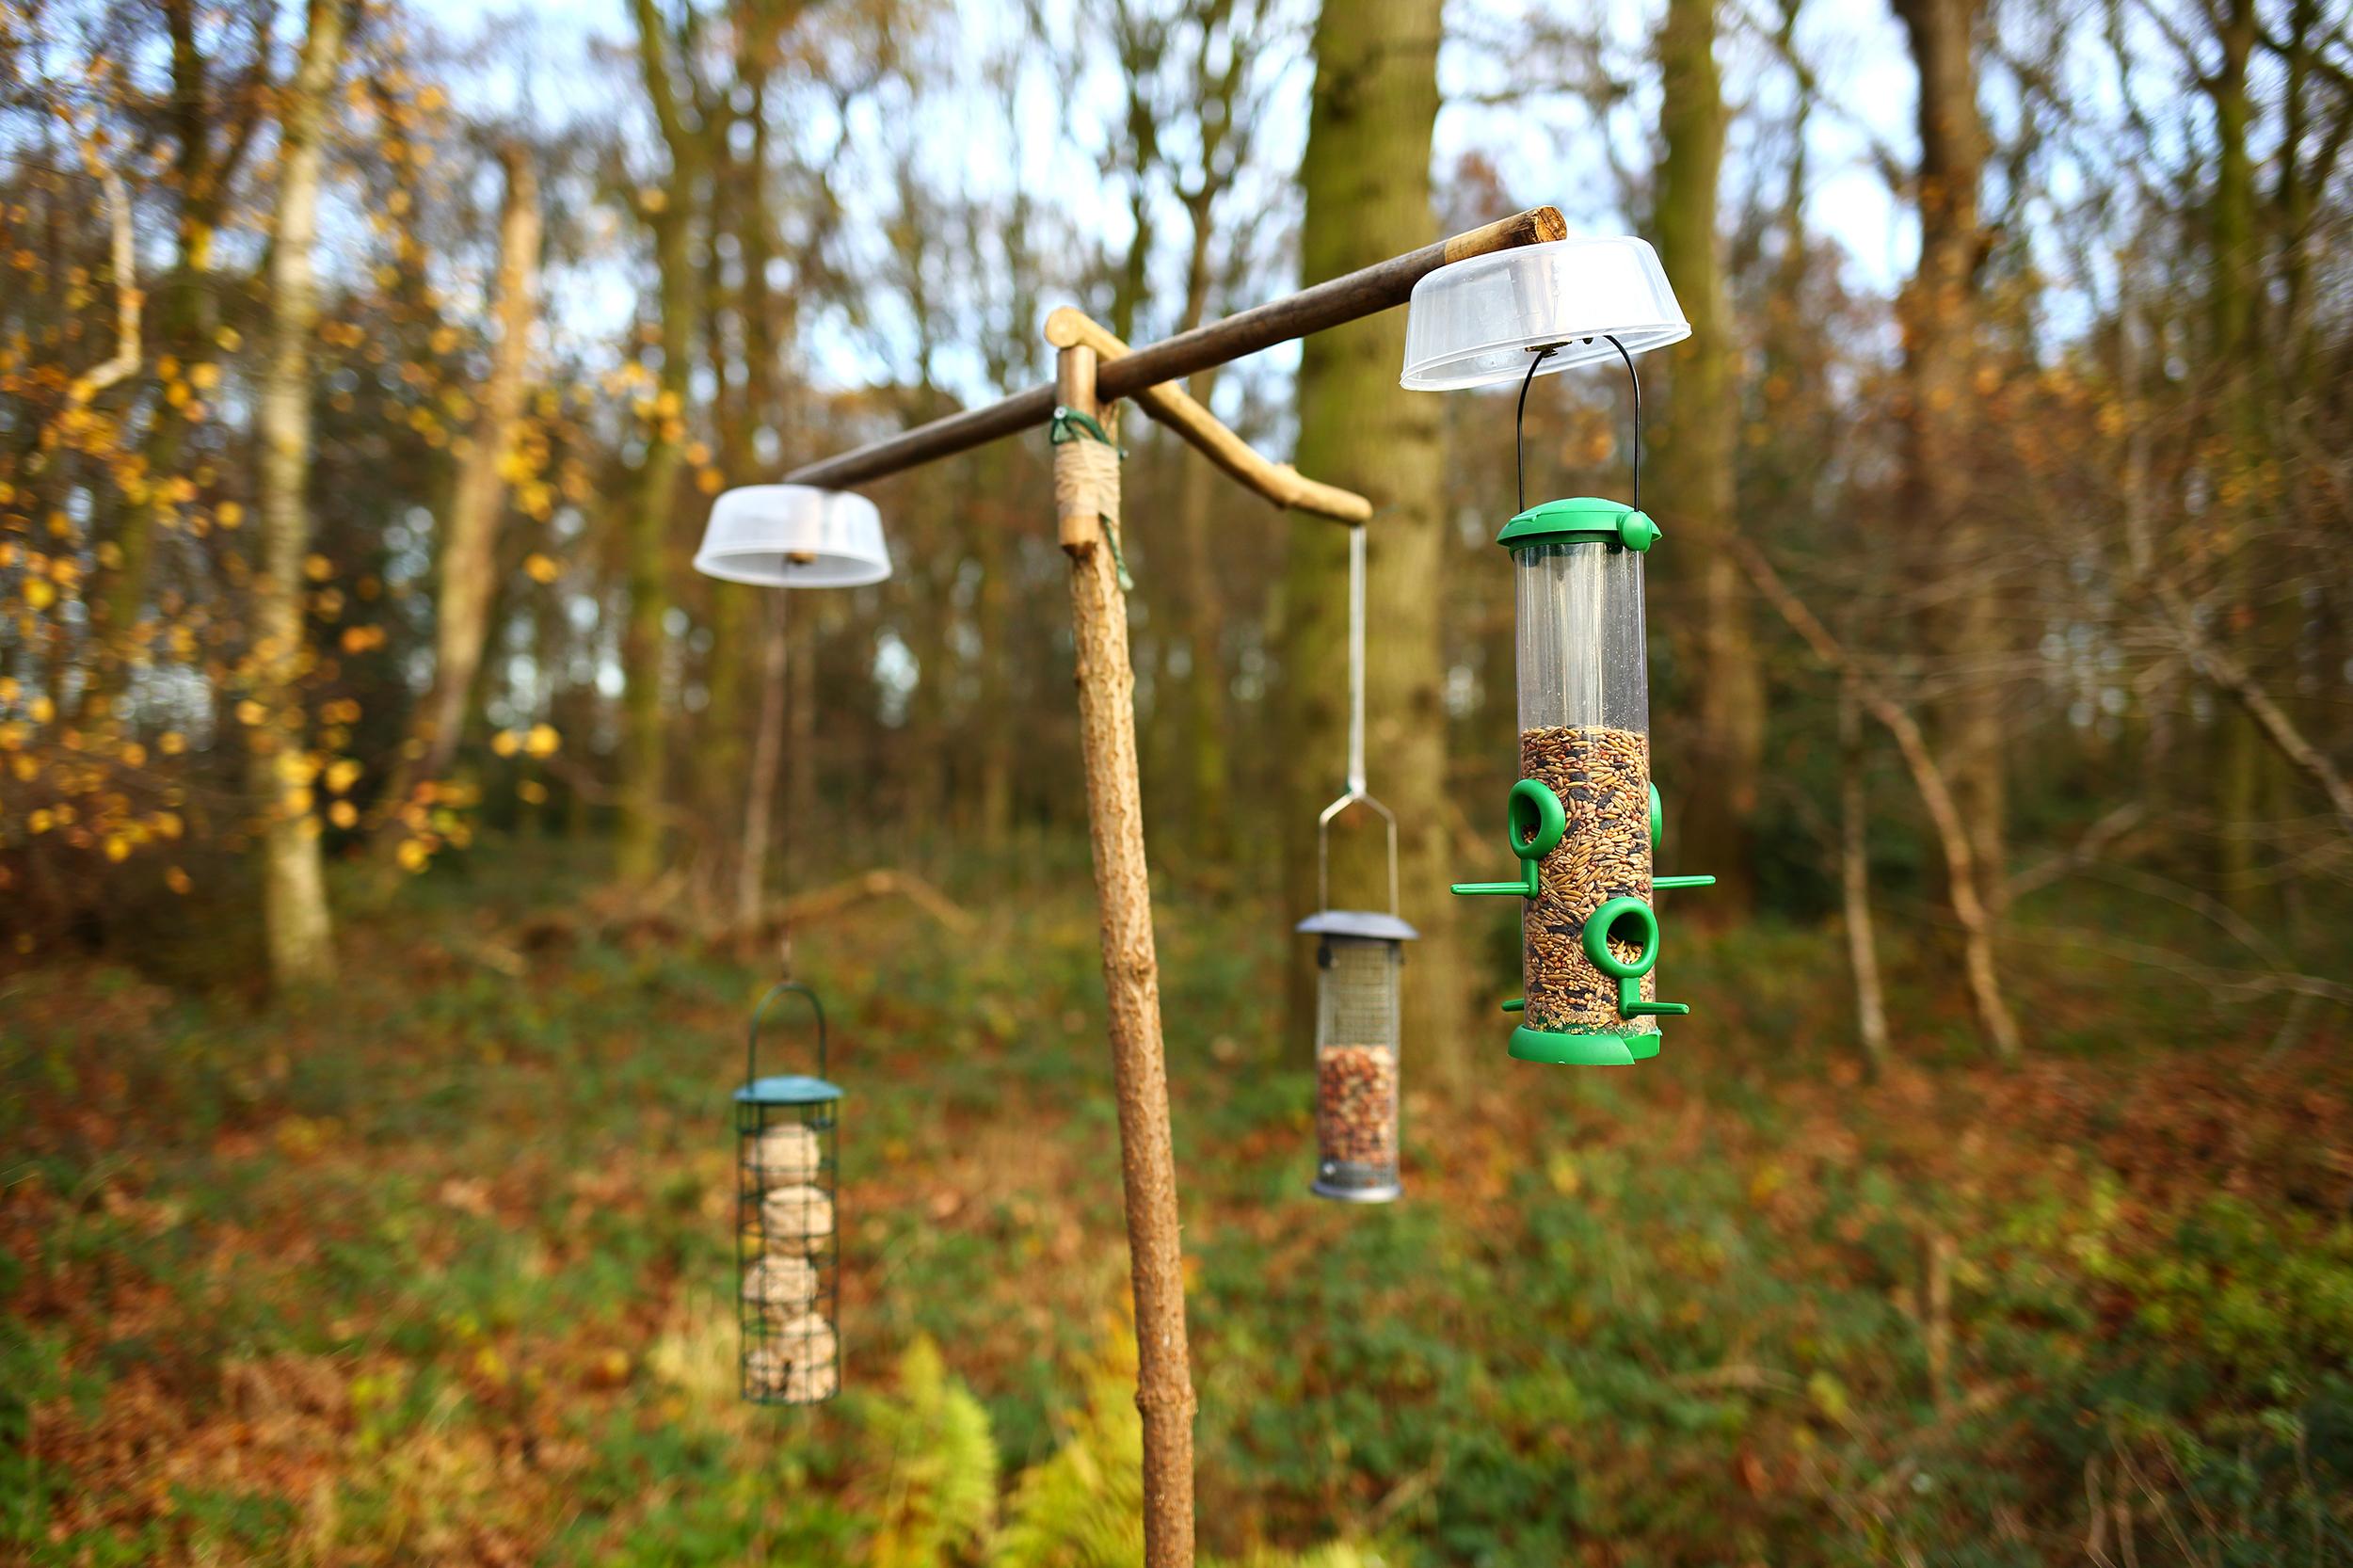 simon, roy, photography, yorkshire, wildlife, photographer, woodland, hide, feeders